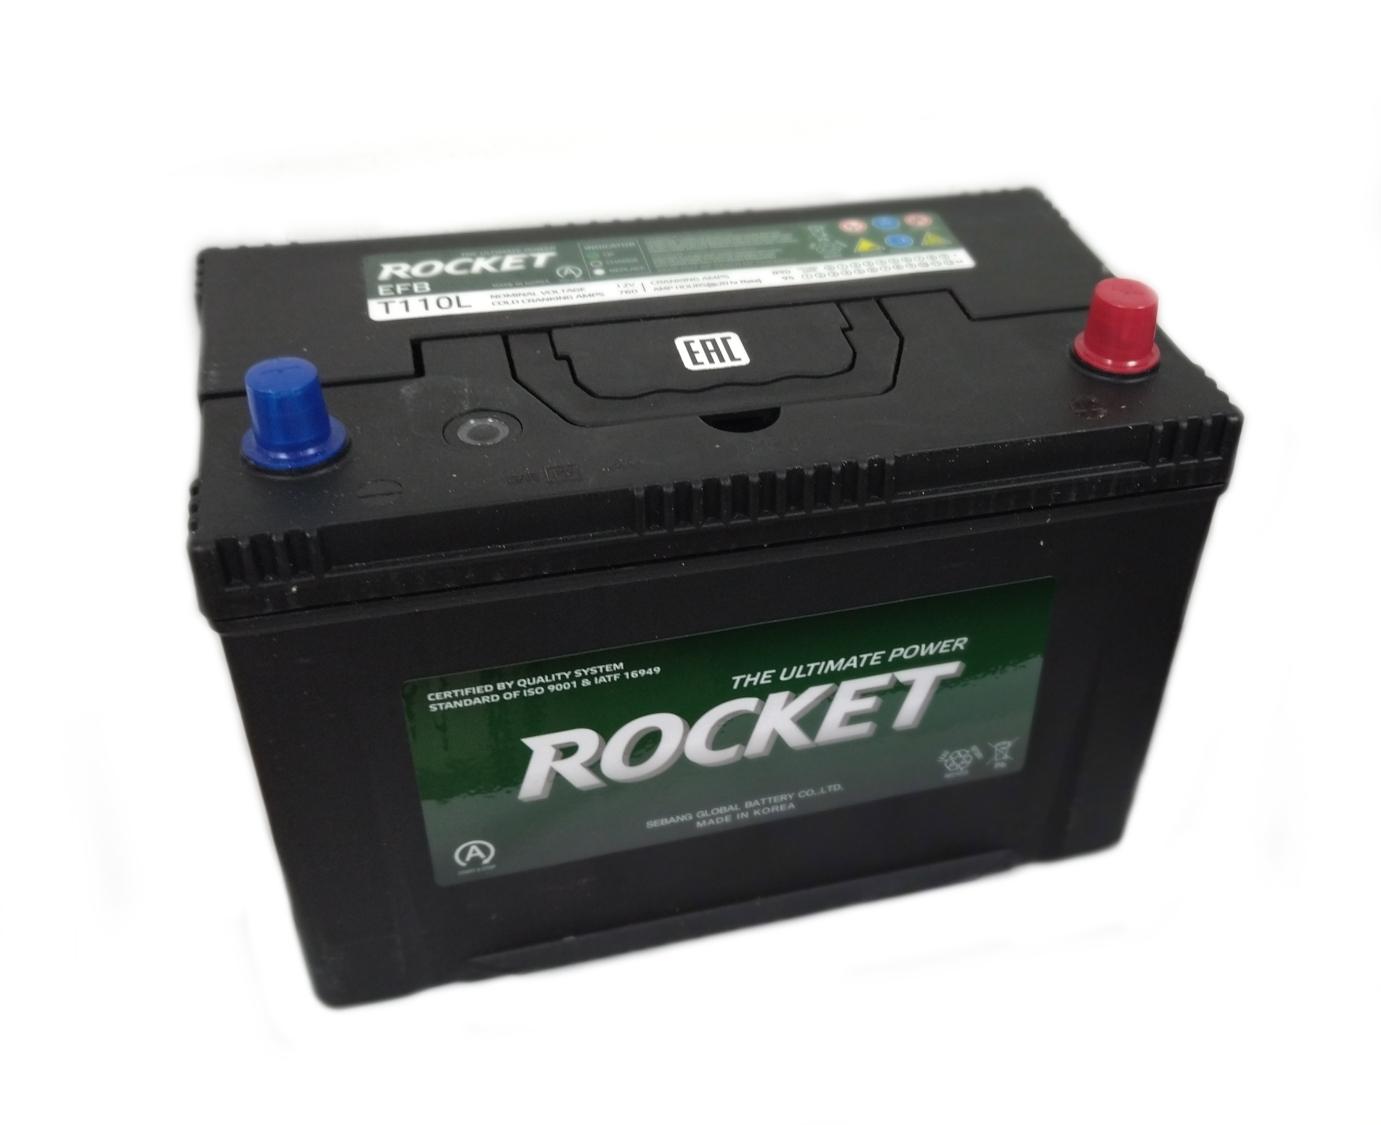 Rocket EFB T110L